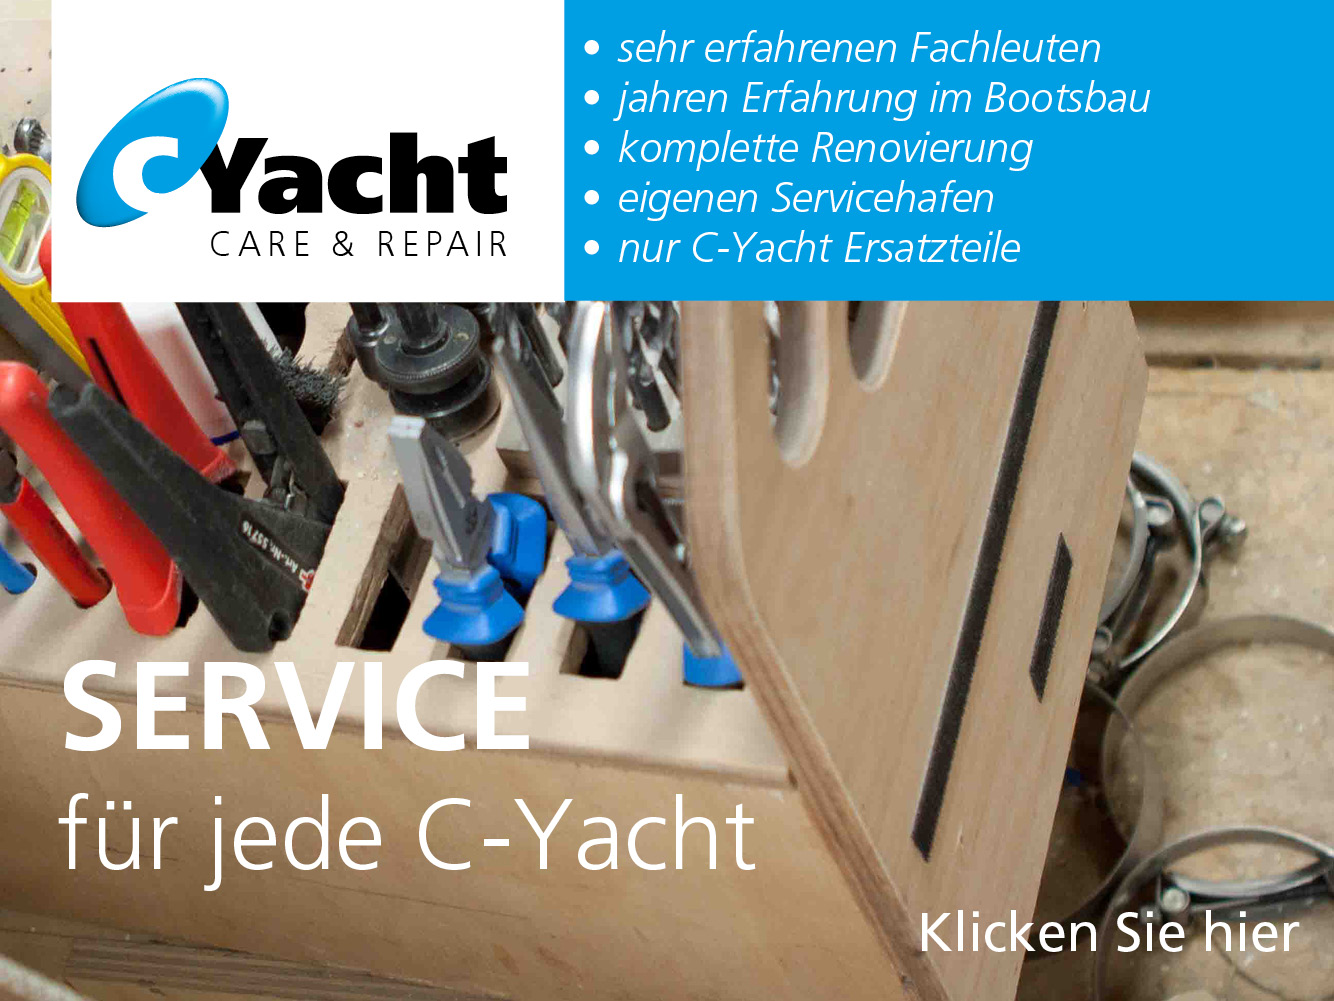 service-c-yacht-care-repair-d